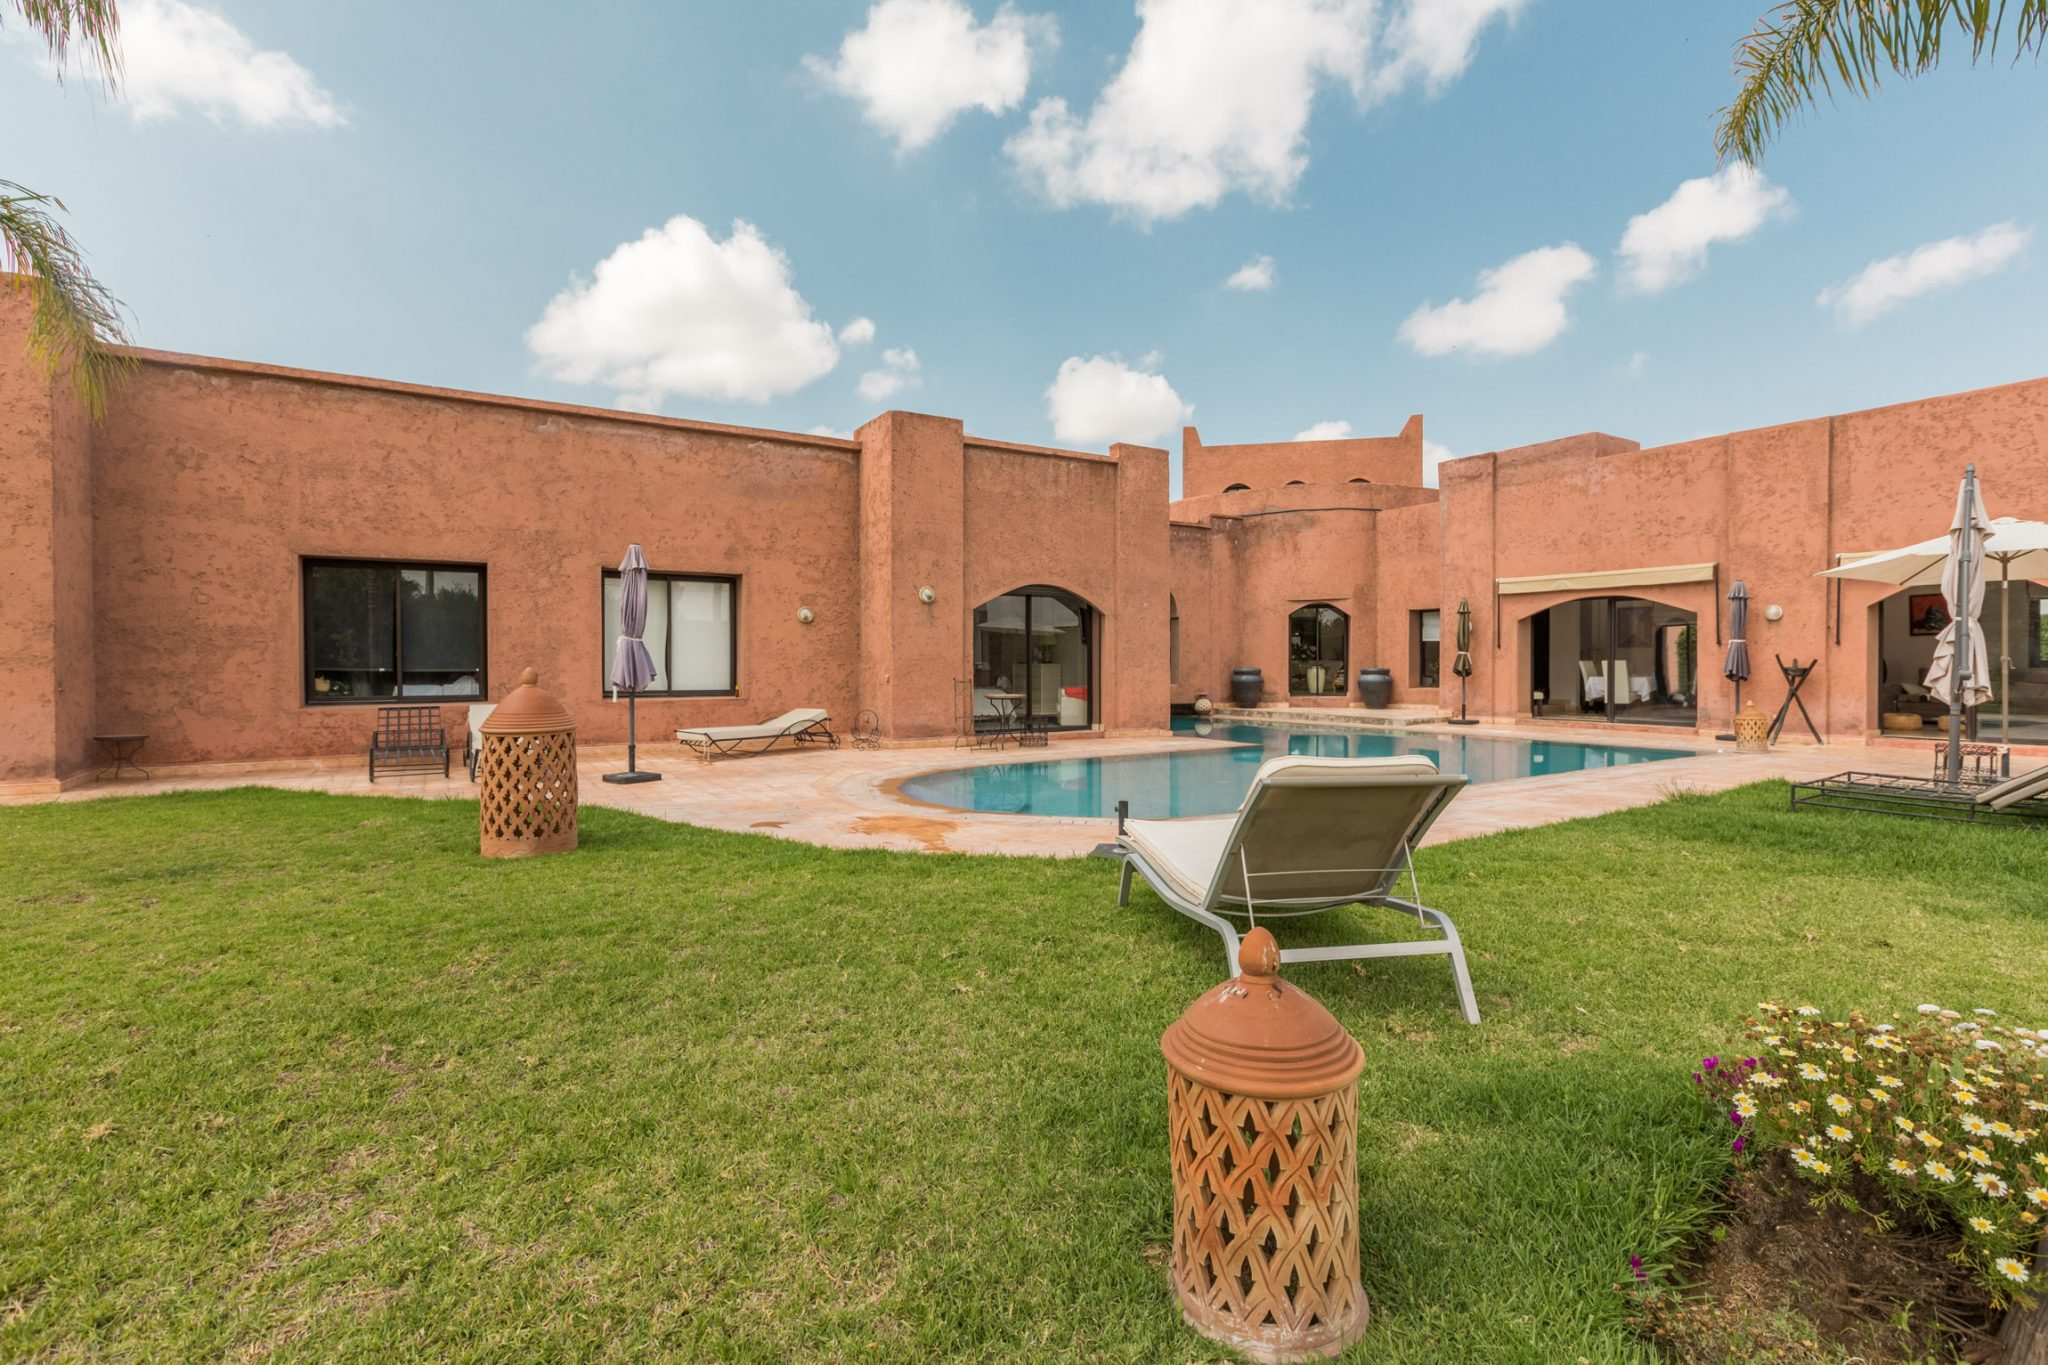 Location villa marrakech belle villa avec piscine priv e for Piscine privee marrakech